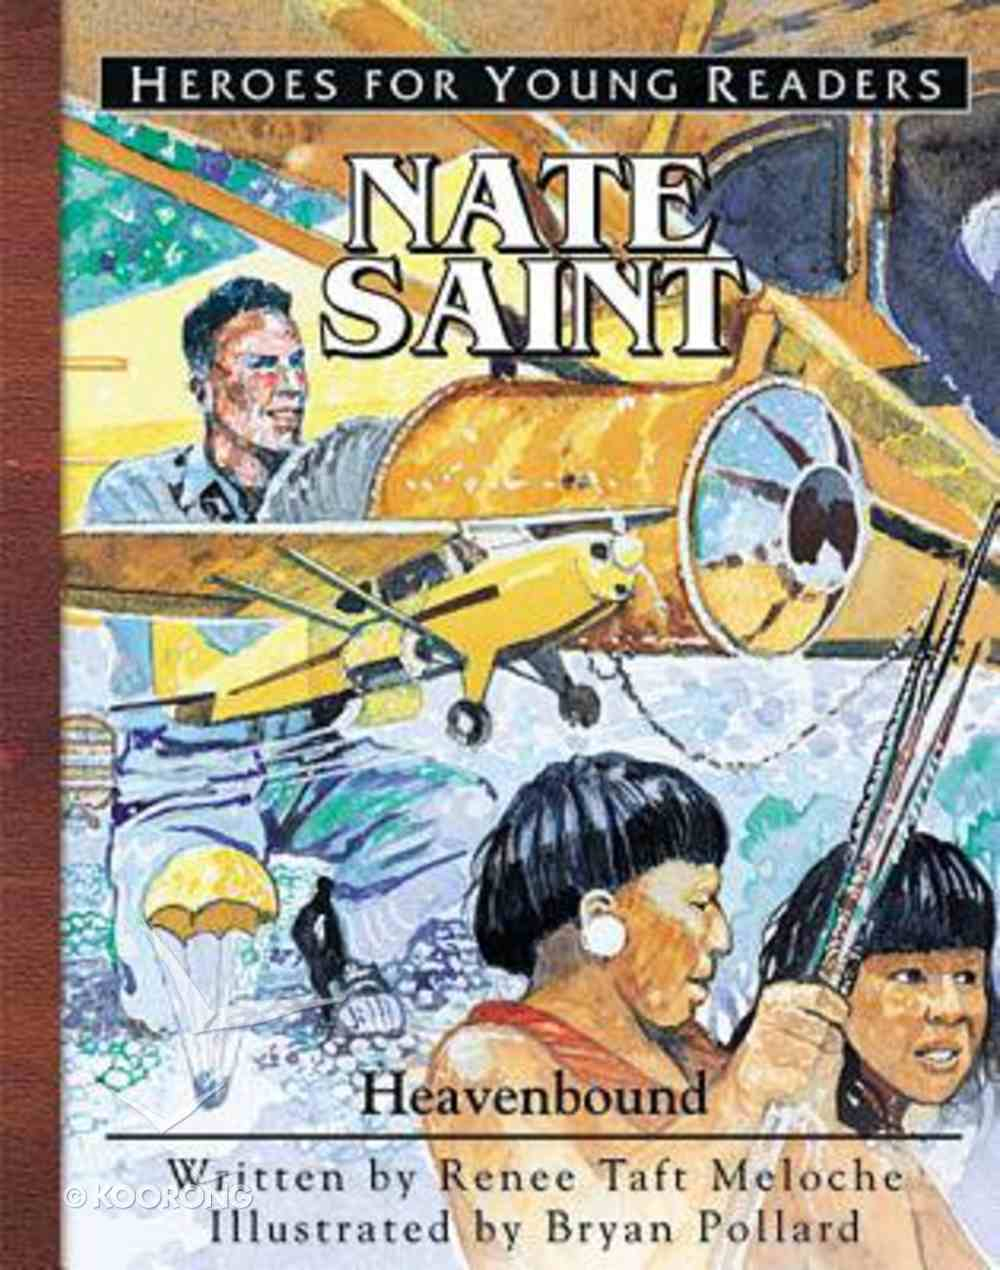 Nate Saint - Heavenbound (Heroes For Young Readers Series) Hardback